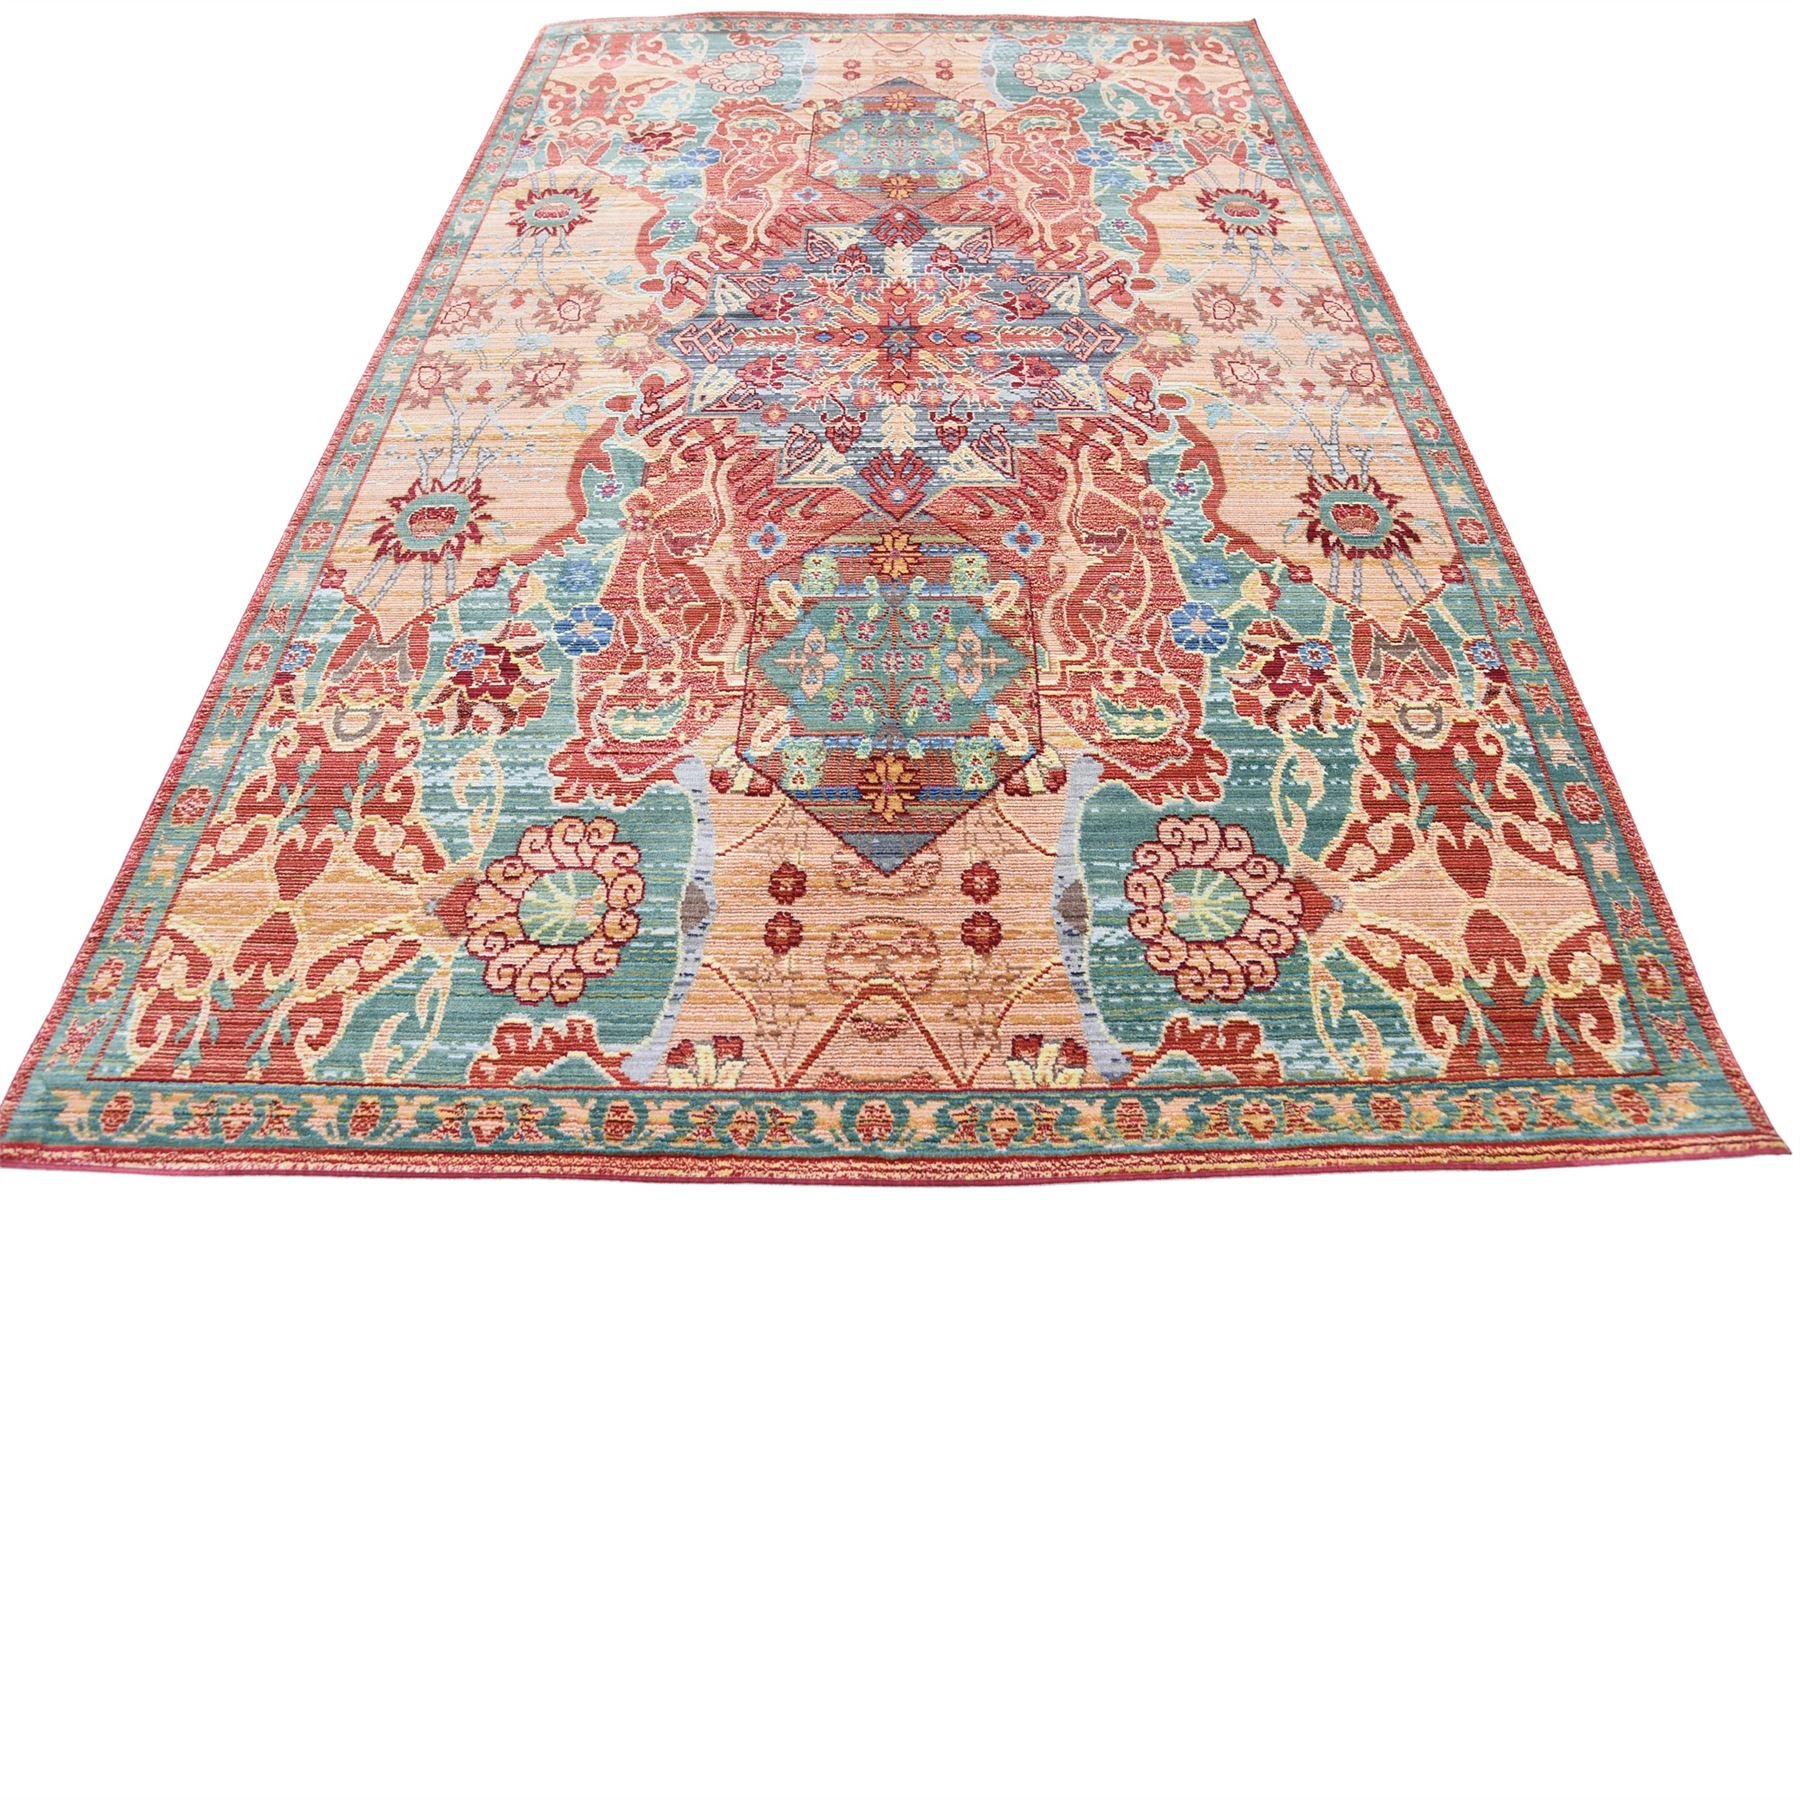 Persain Rug: Persian Style Rugs Traditional Area Rug Carpet Oriental